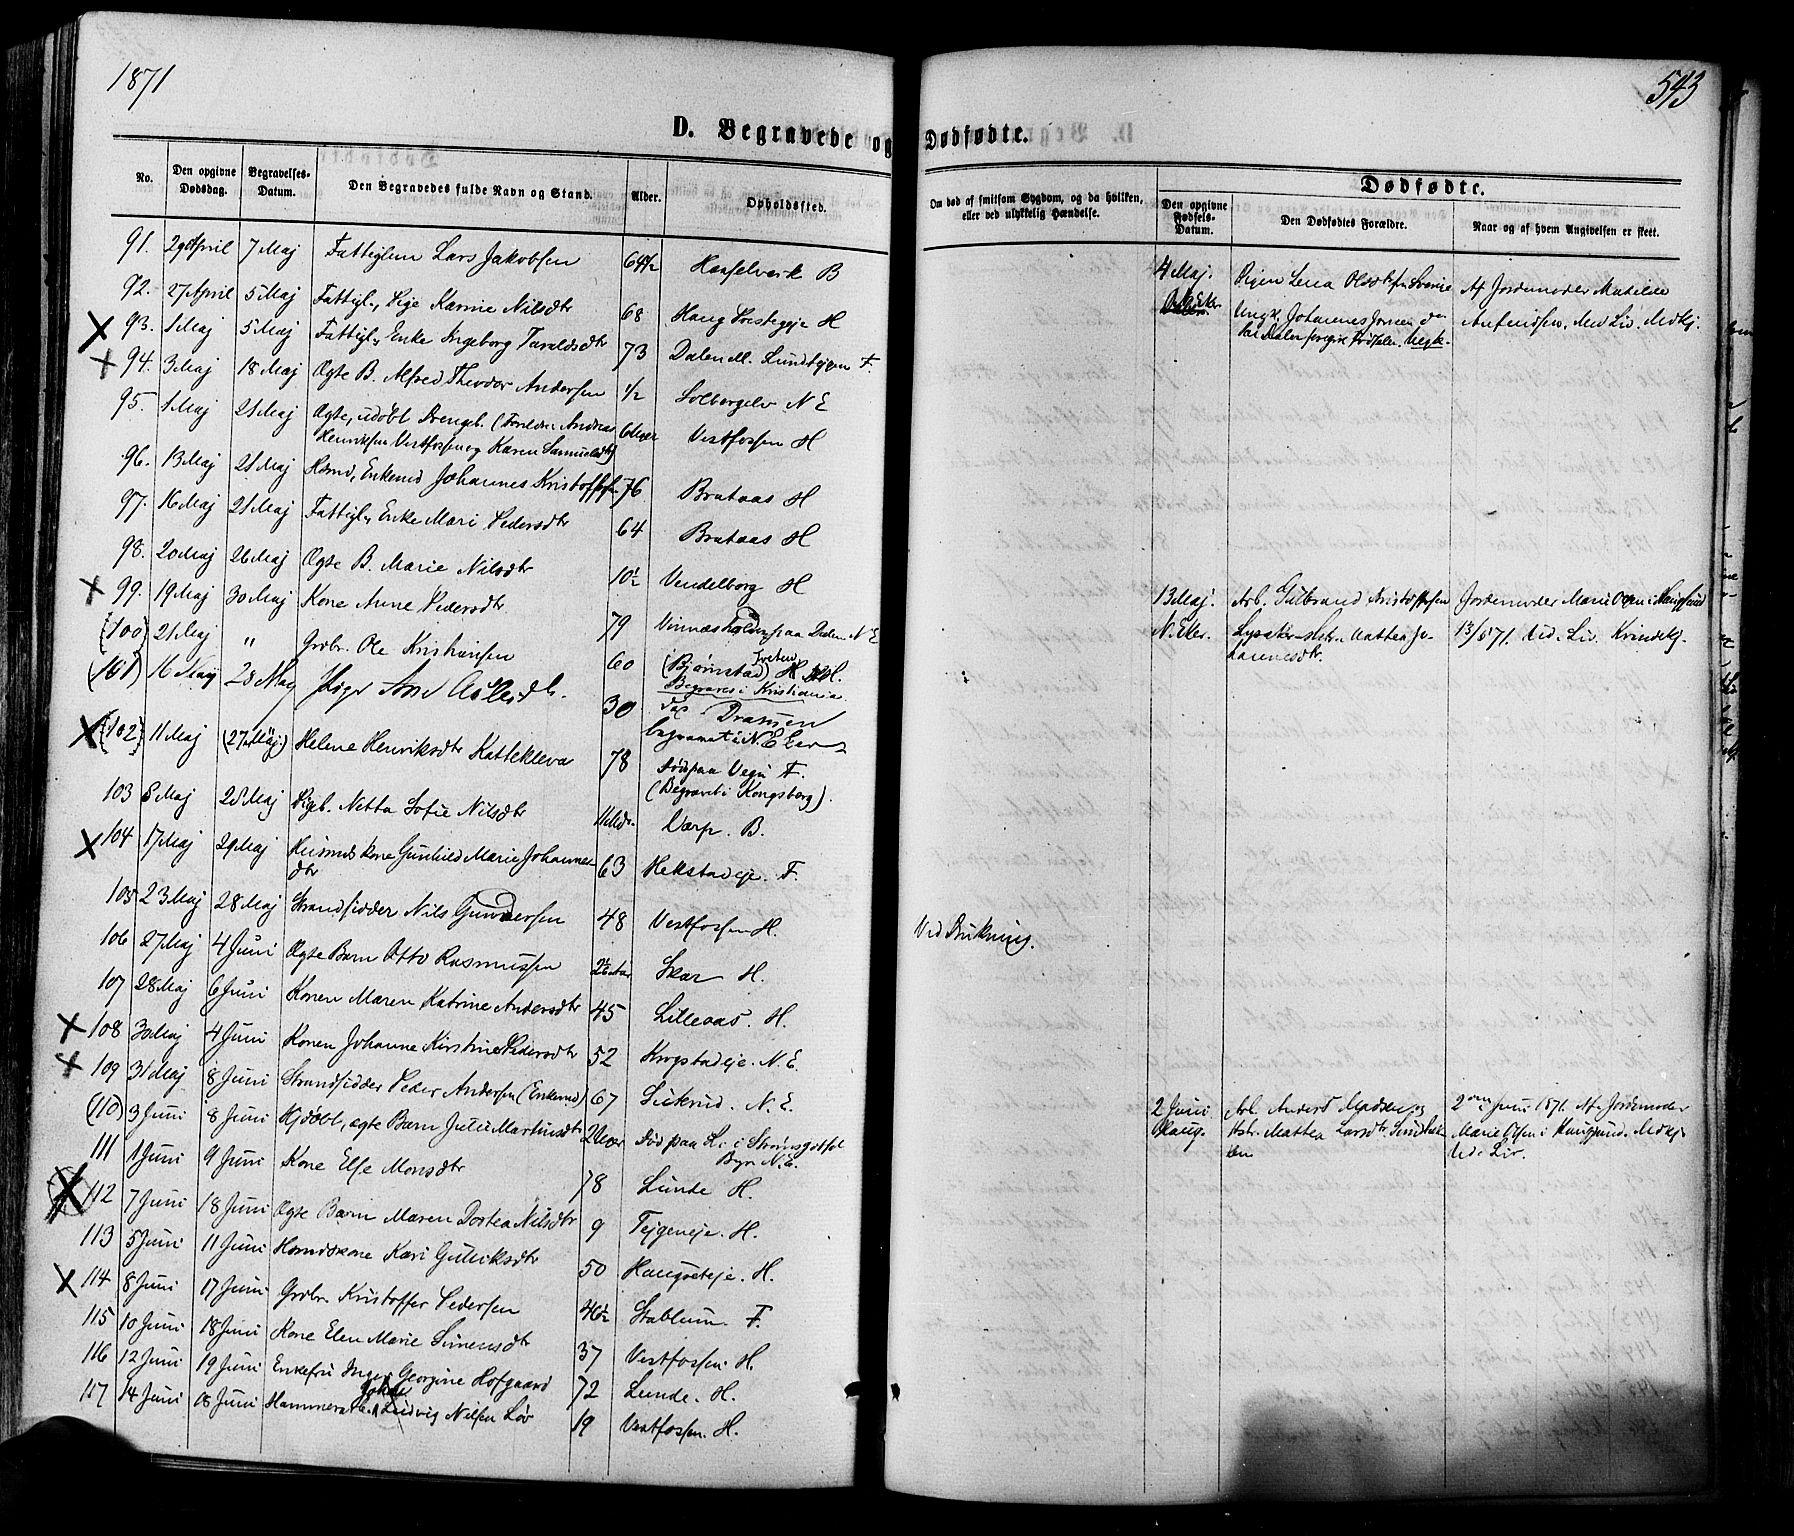 SAKO, Eiker kirkebøker, F/Fa/L0017: Ministerialbok nr. I 17, 1869-1877, s. 543